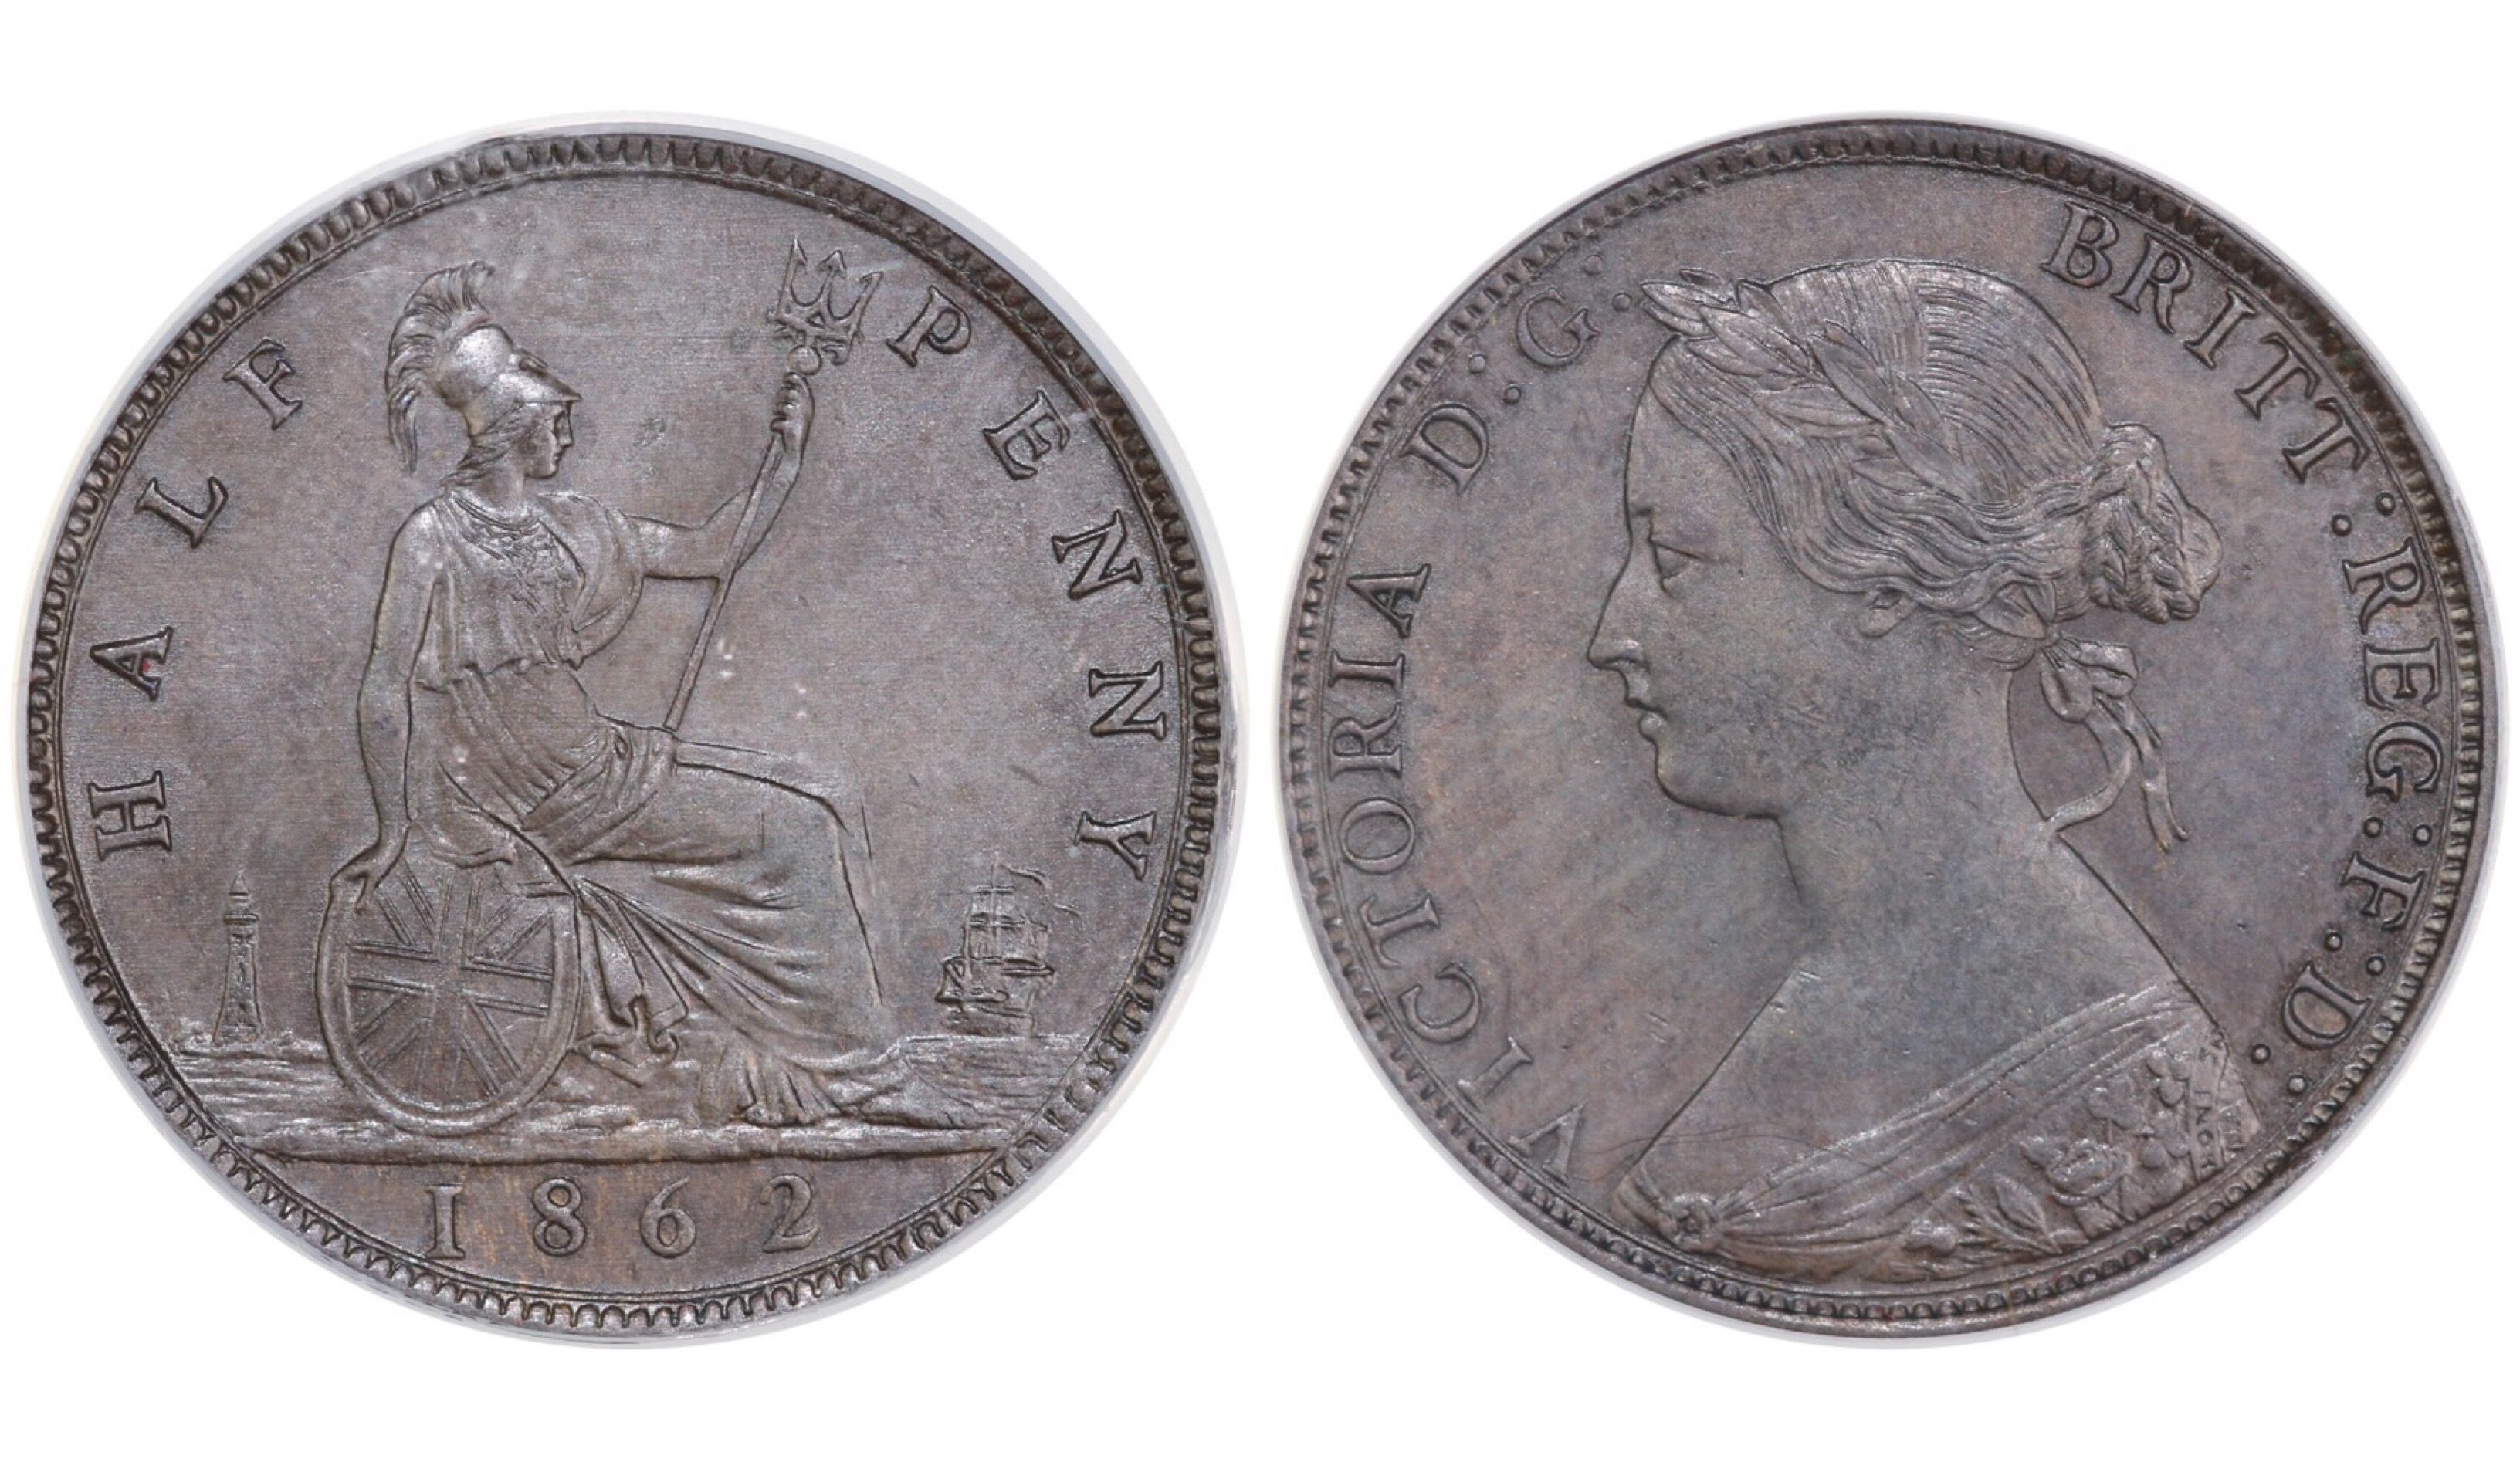 1862 Halfpenny, CGS 78, UNC, Victoria, Freeman 289, UIN 22230